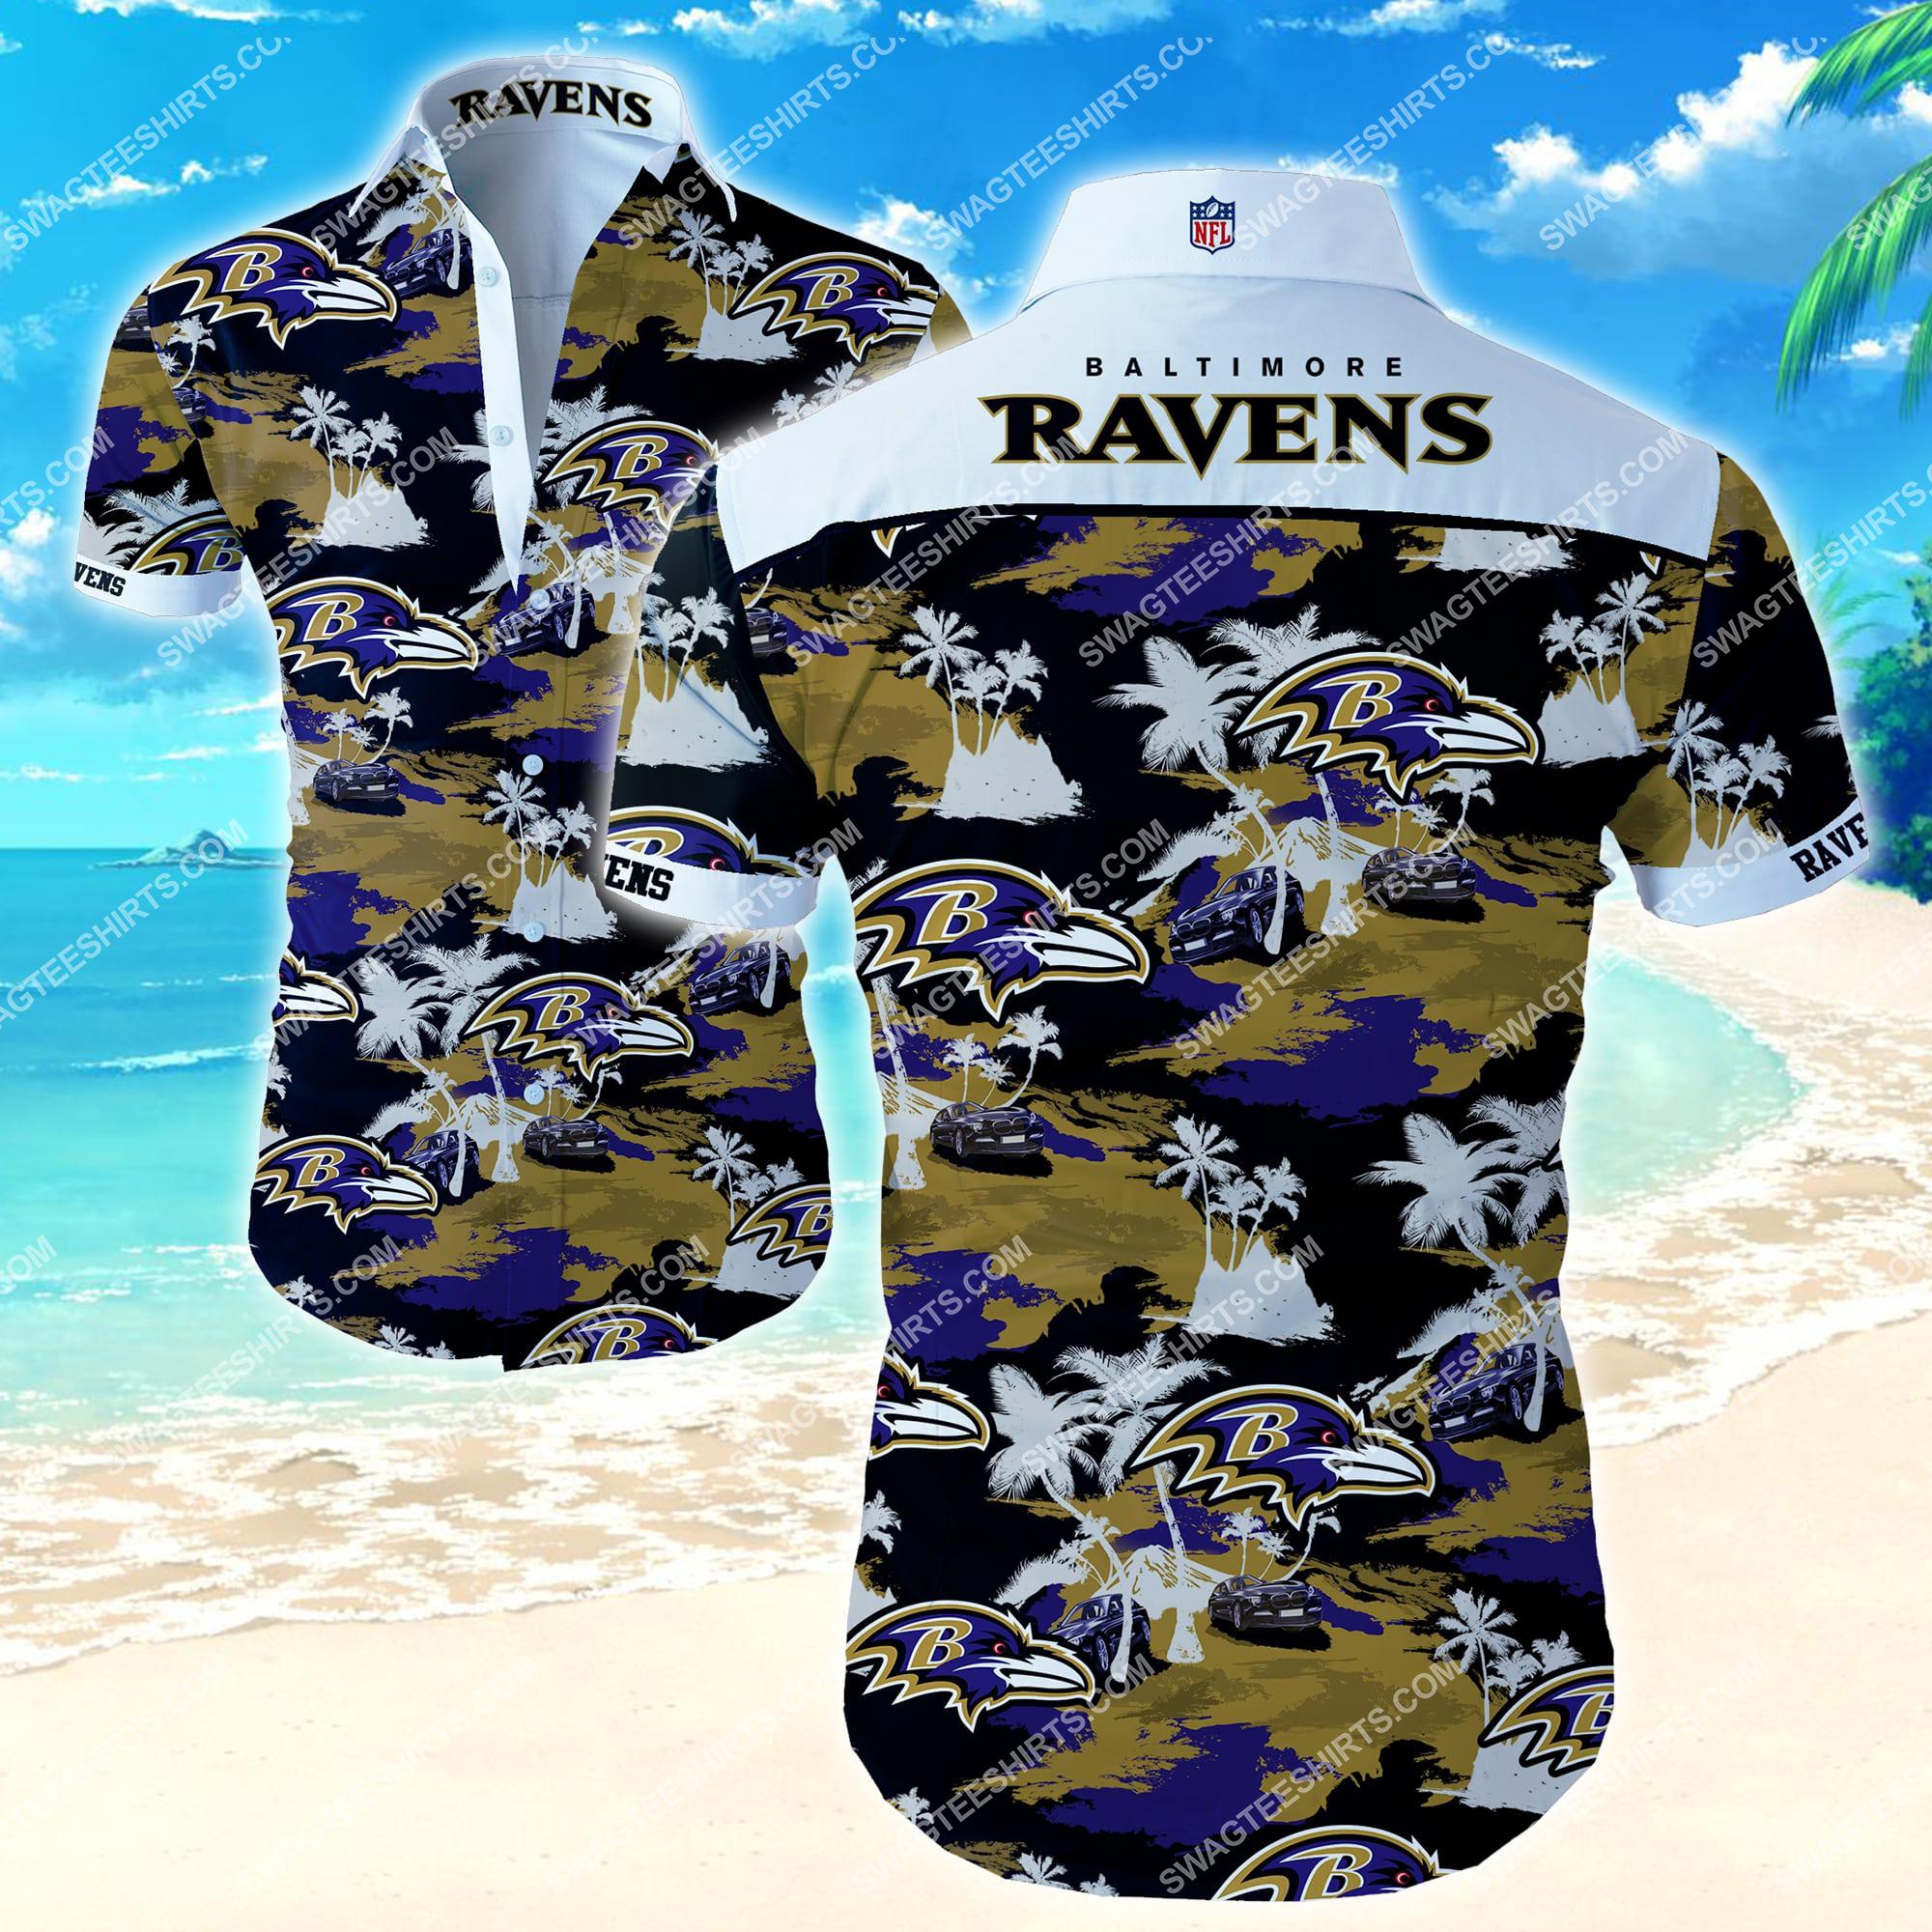 the baltimore ravens football team full printing summer hawaiian shirt 2 - Copy (3)